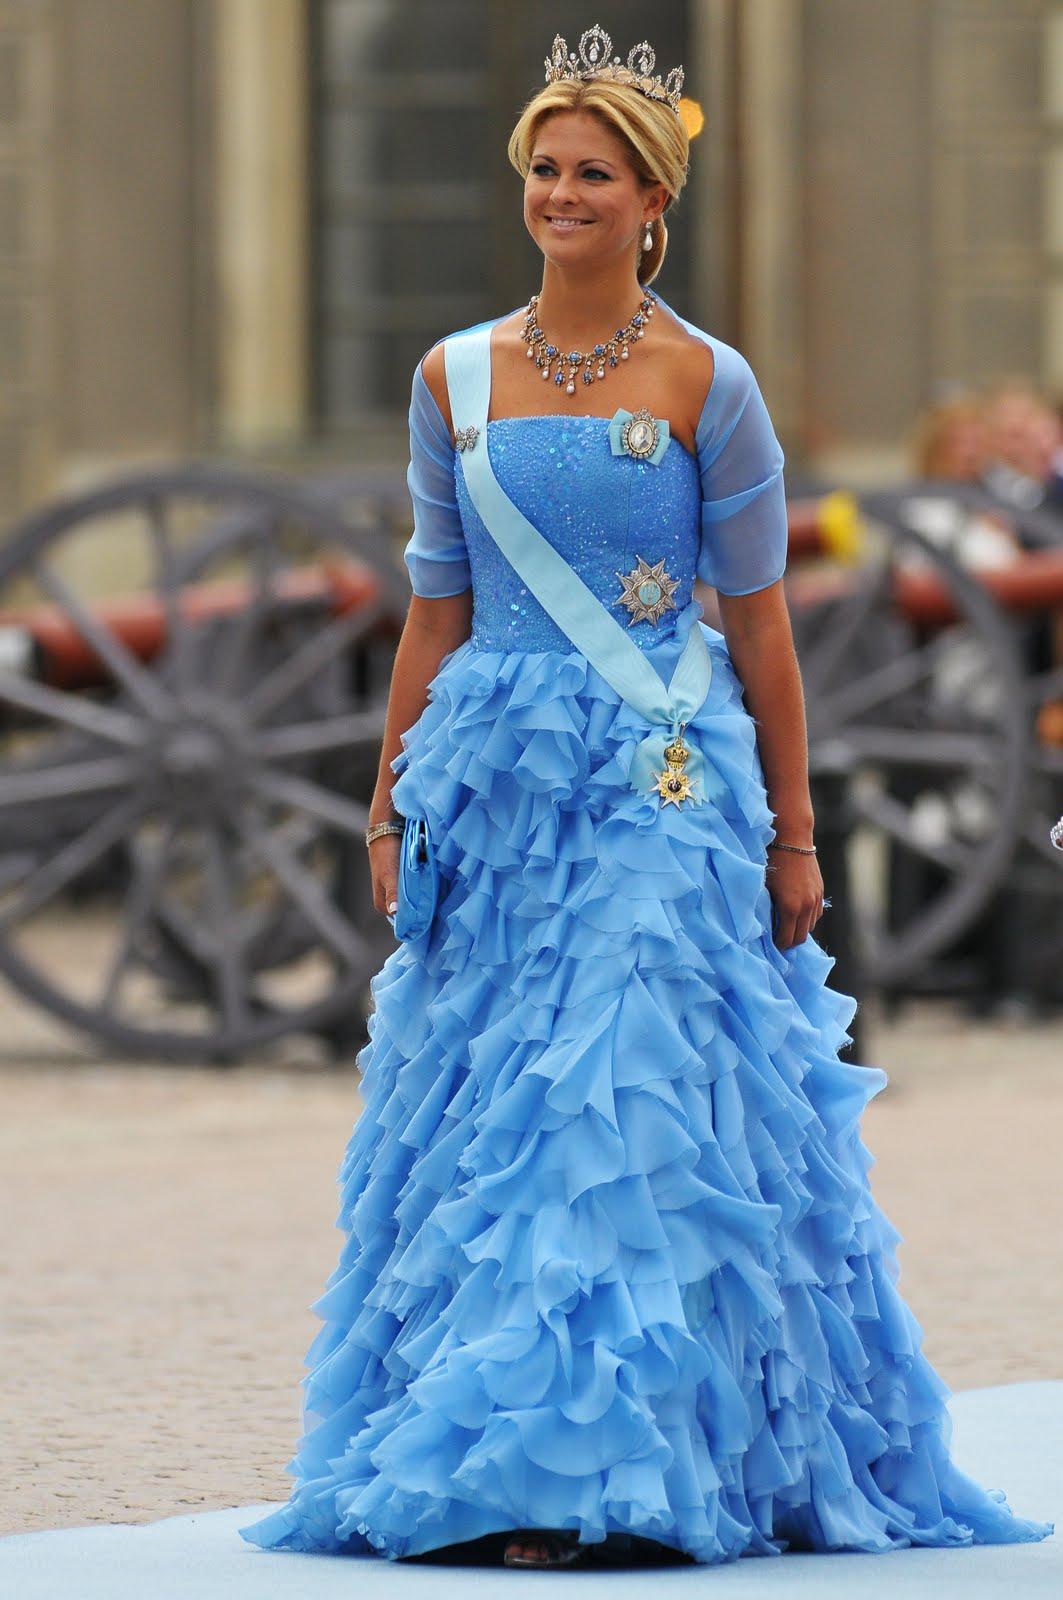 Crown Princess Victoria: Princess Madeleine at Royal Wedding